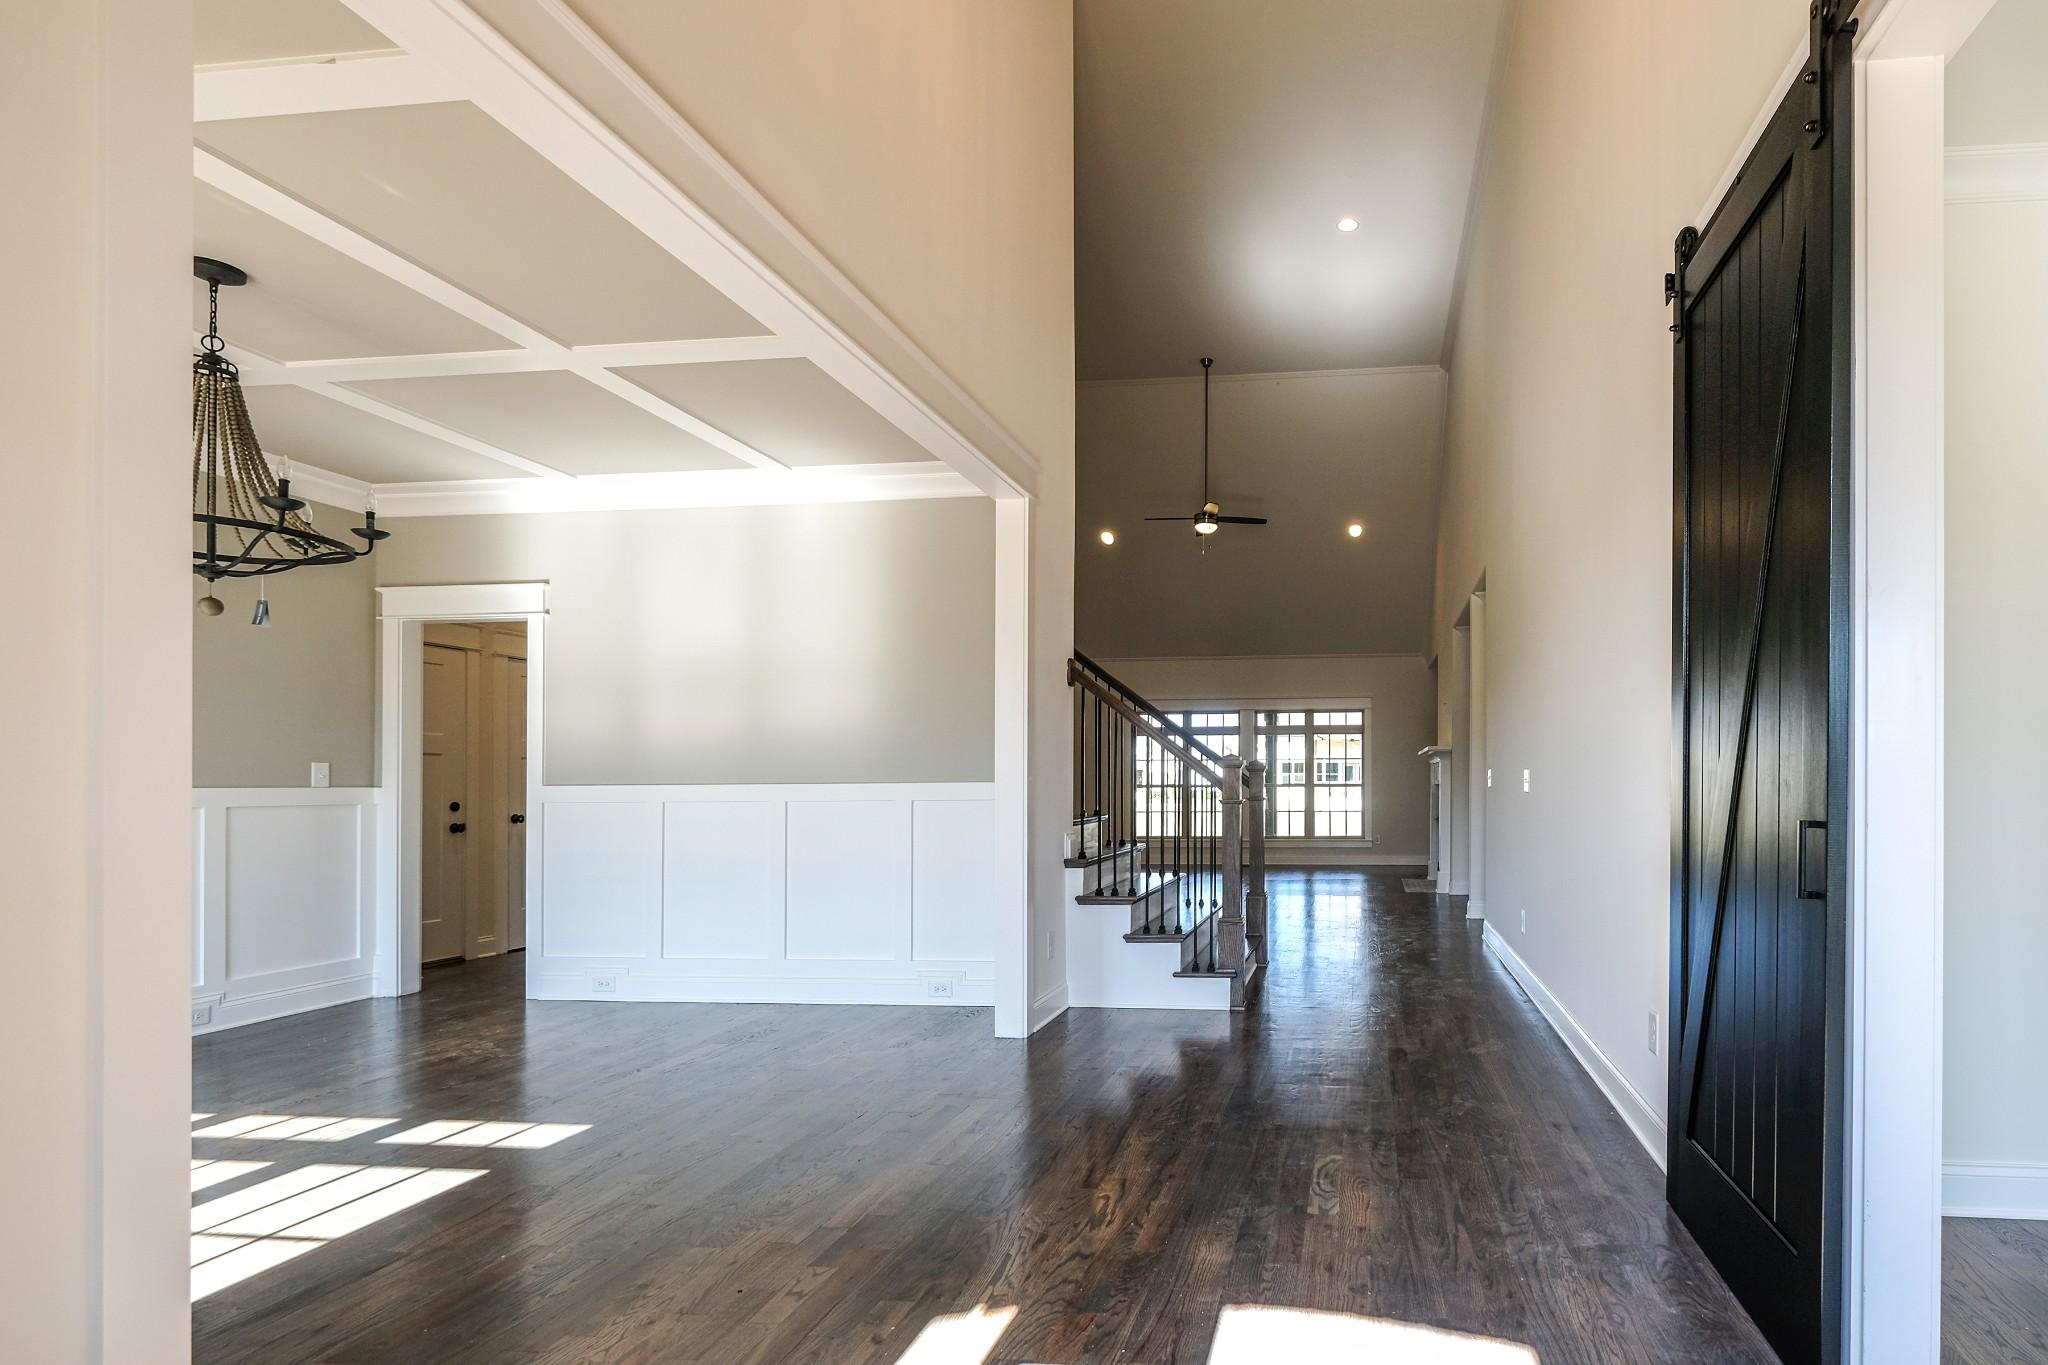 2036 Autumn Ridge Way (Lot 277), Spring Hill, TN 37174 - Spring Hill, TN real estate listing